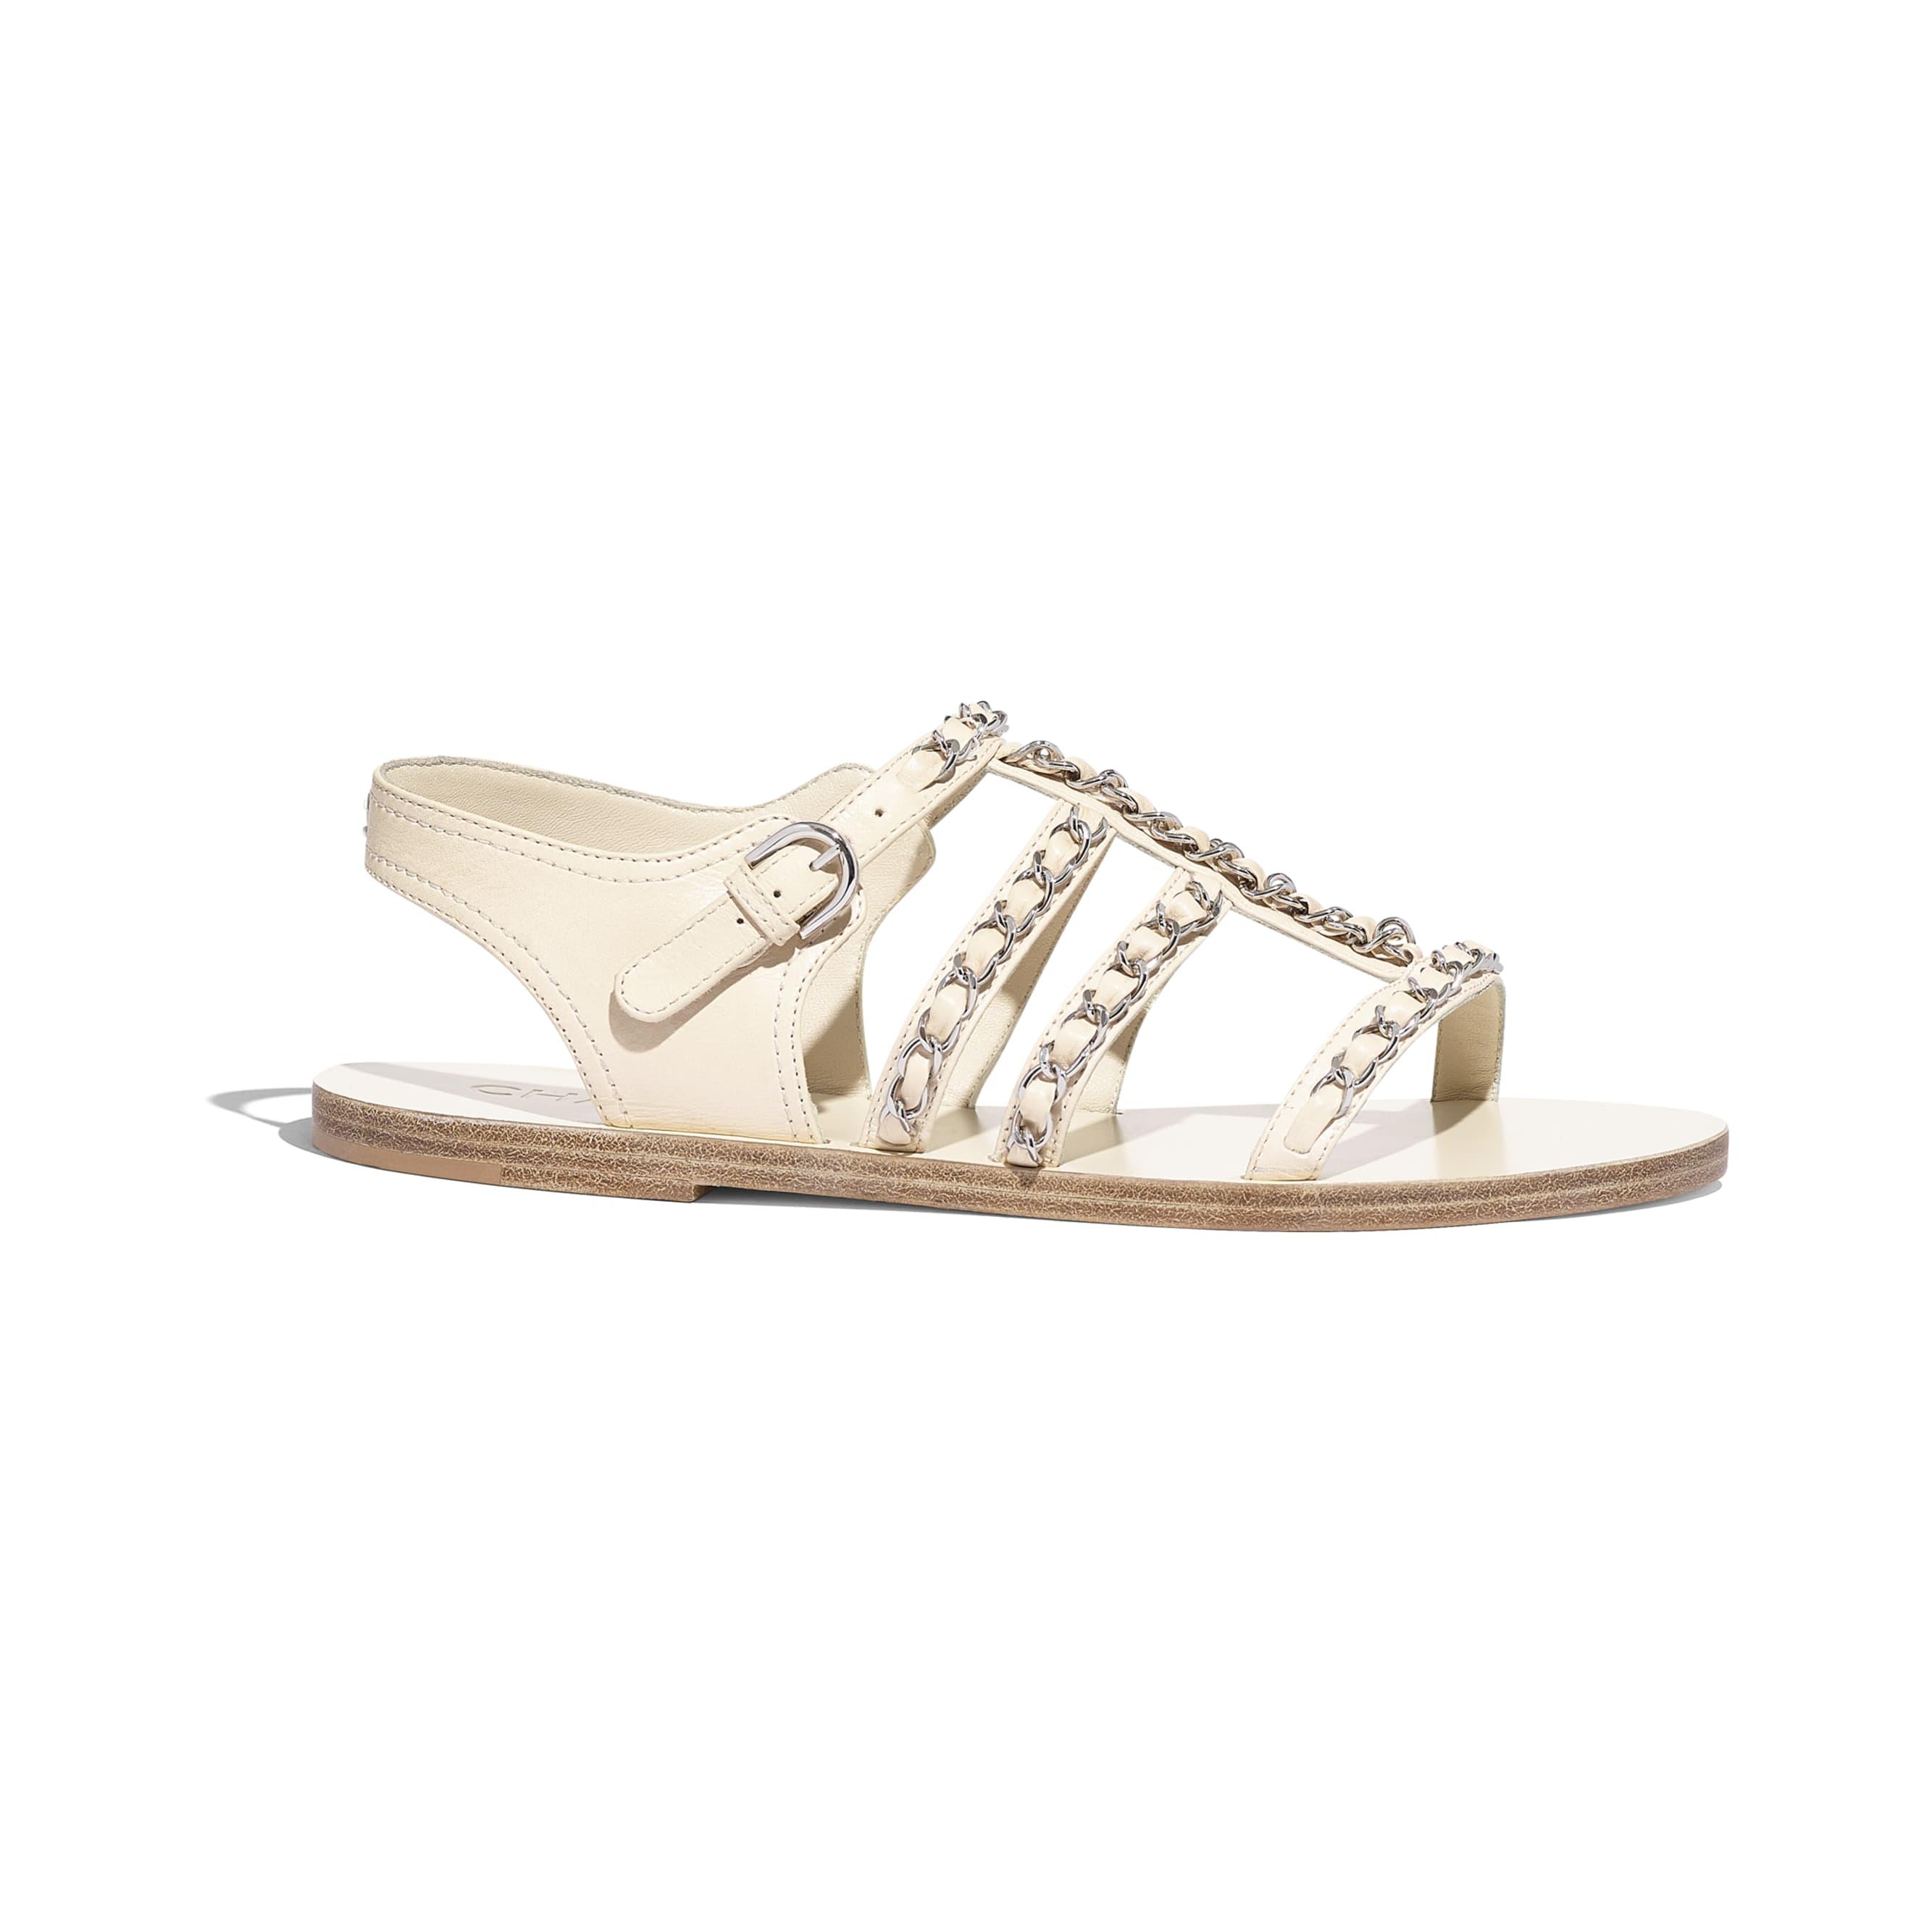 Sandals - White - Calfskin - Default view - see standard sized version